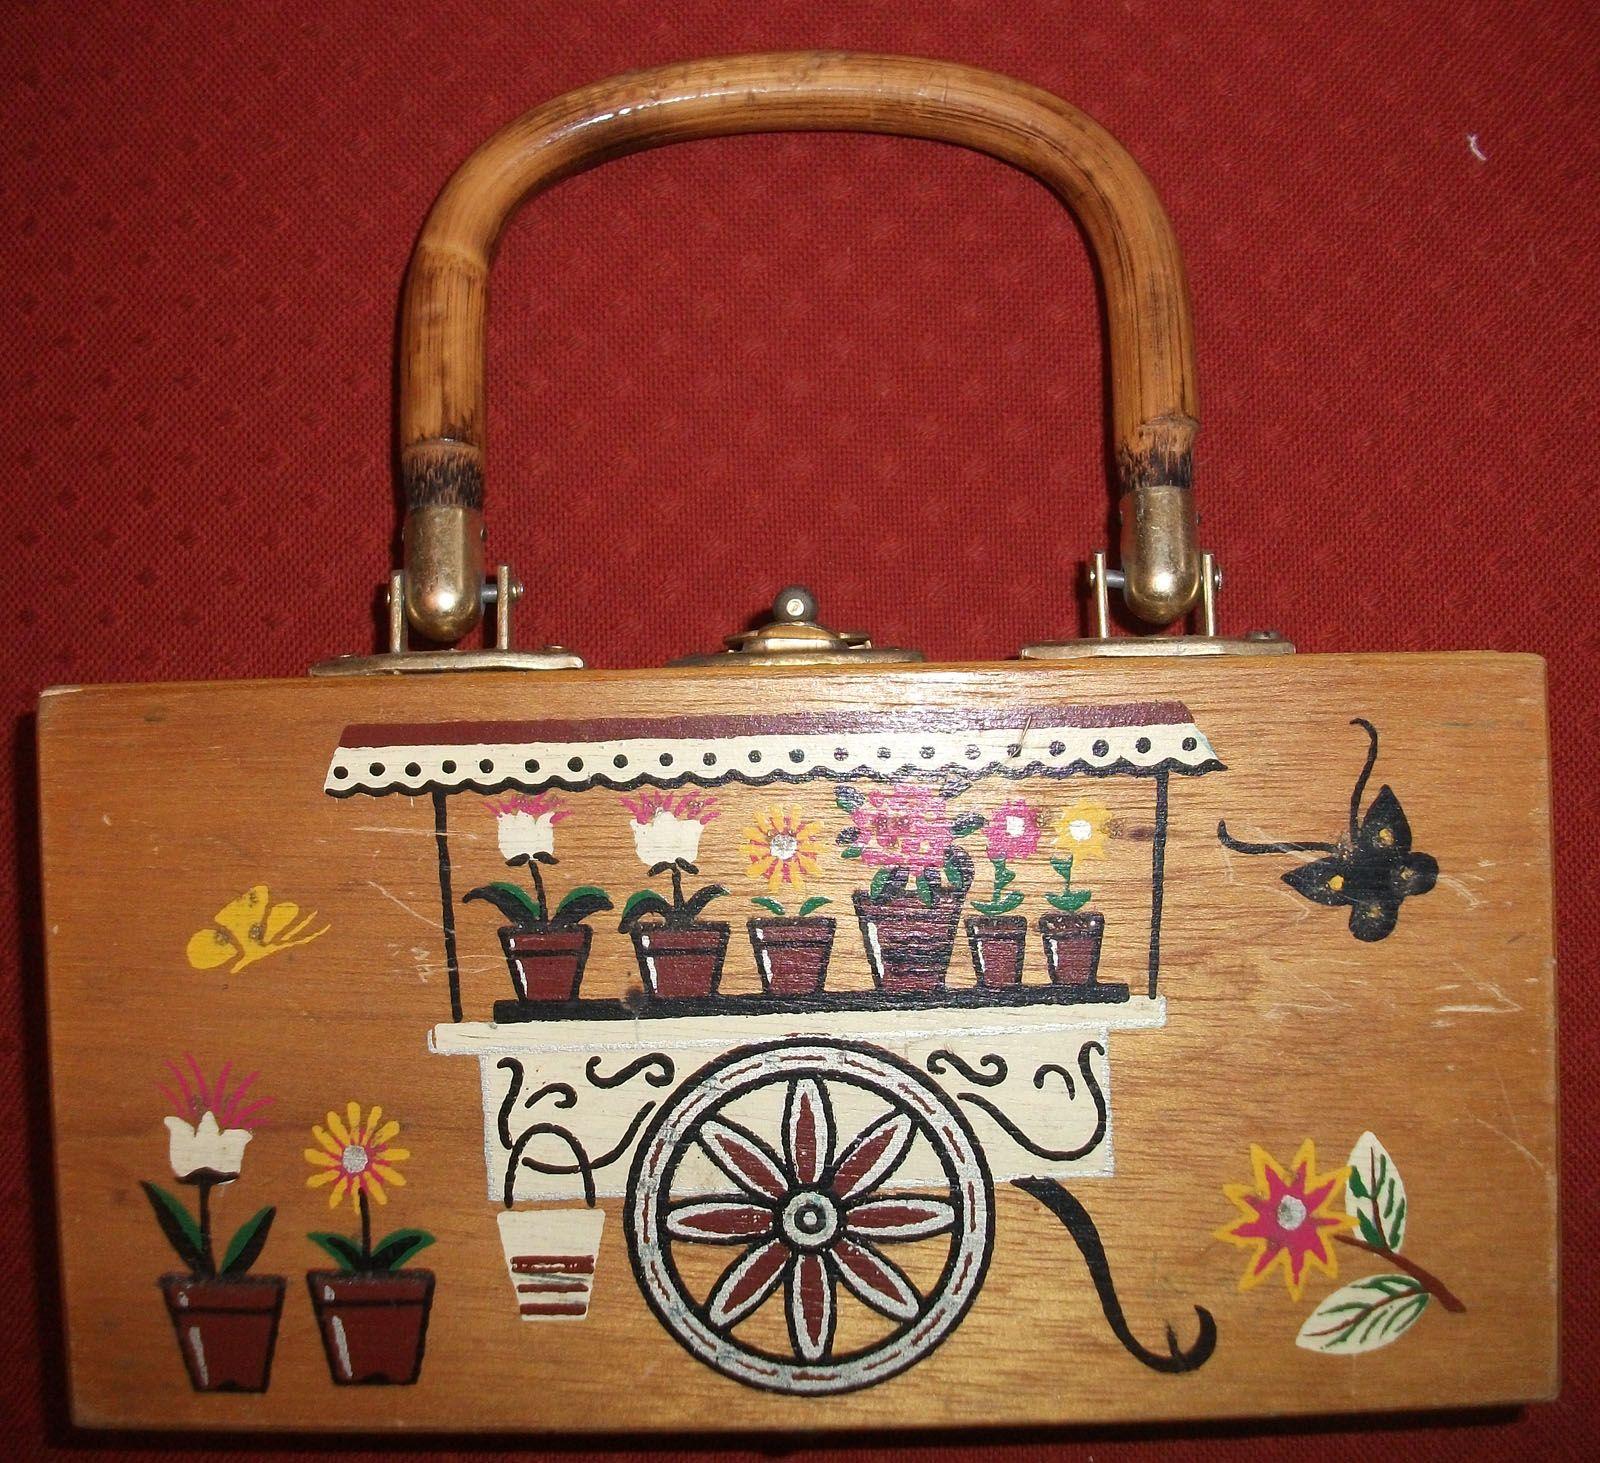 Vintage 1950s Wood Box Purse By Designer Gary Gail Of Dallas Made In Hong Kong Sold Vintage Inspired Handbags Vintage Box Wood Boxes